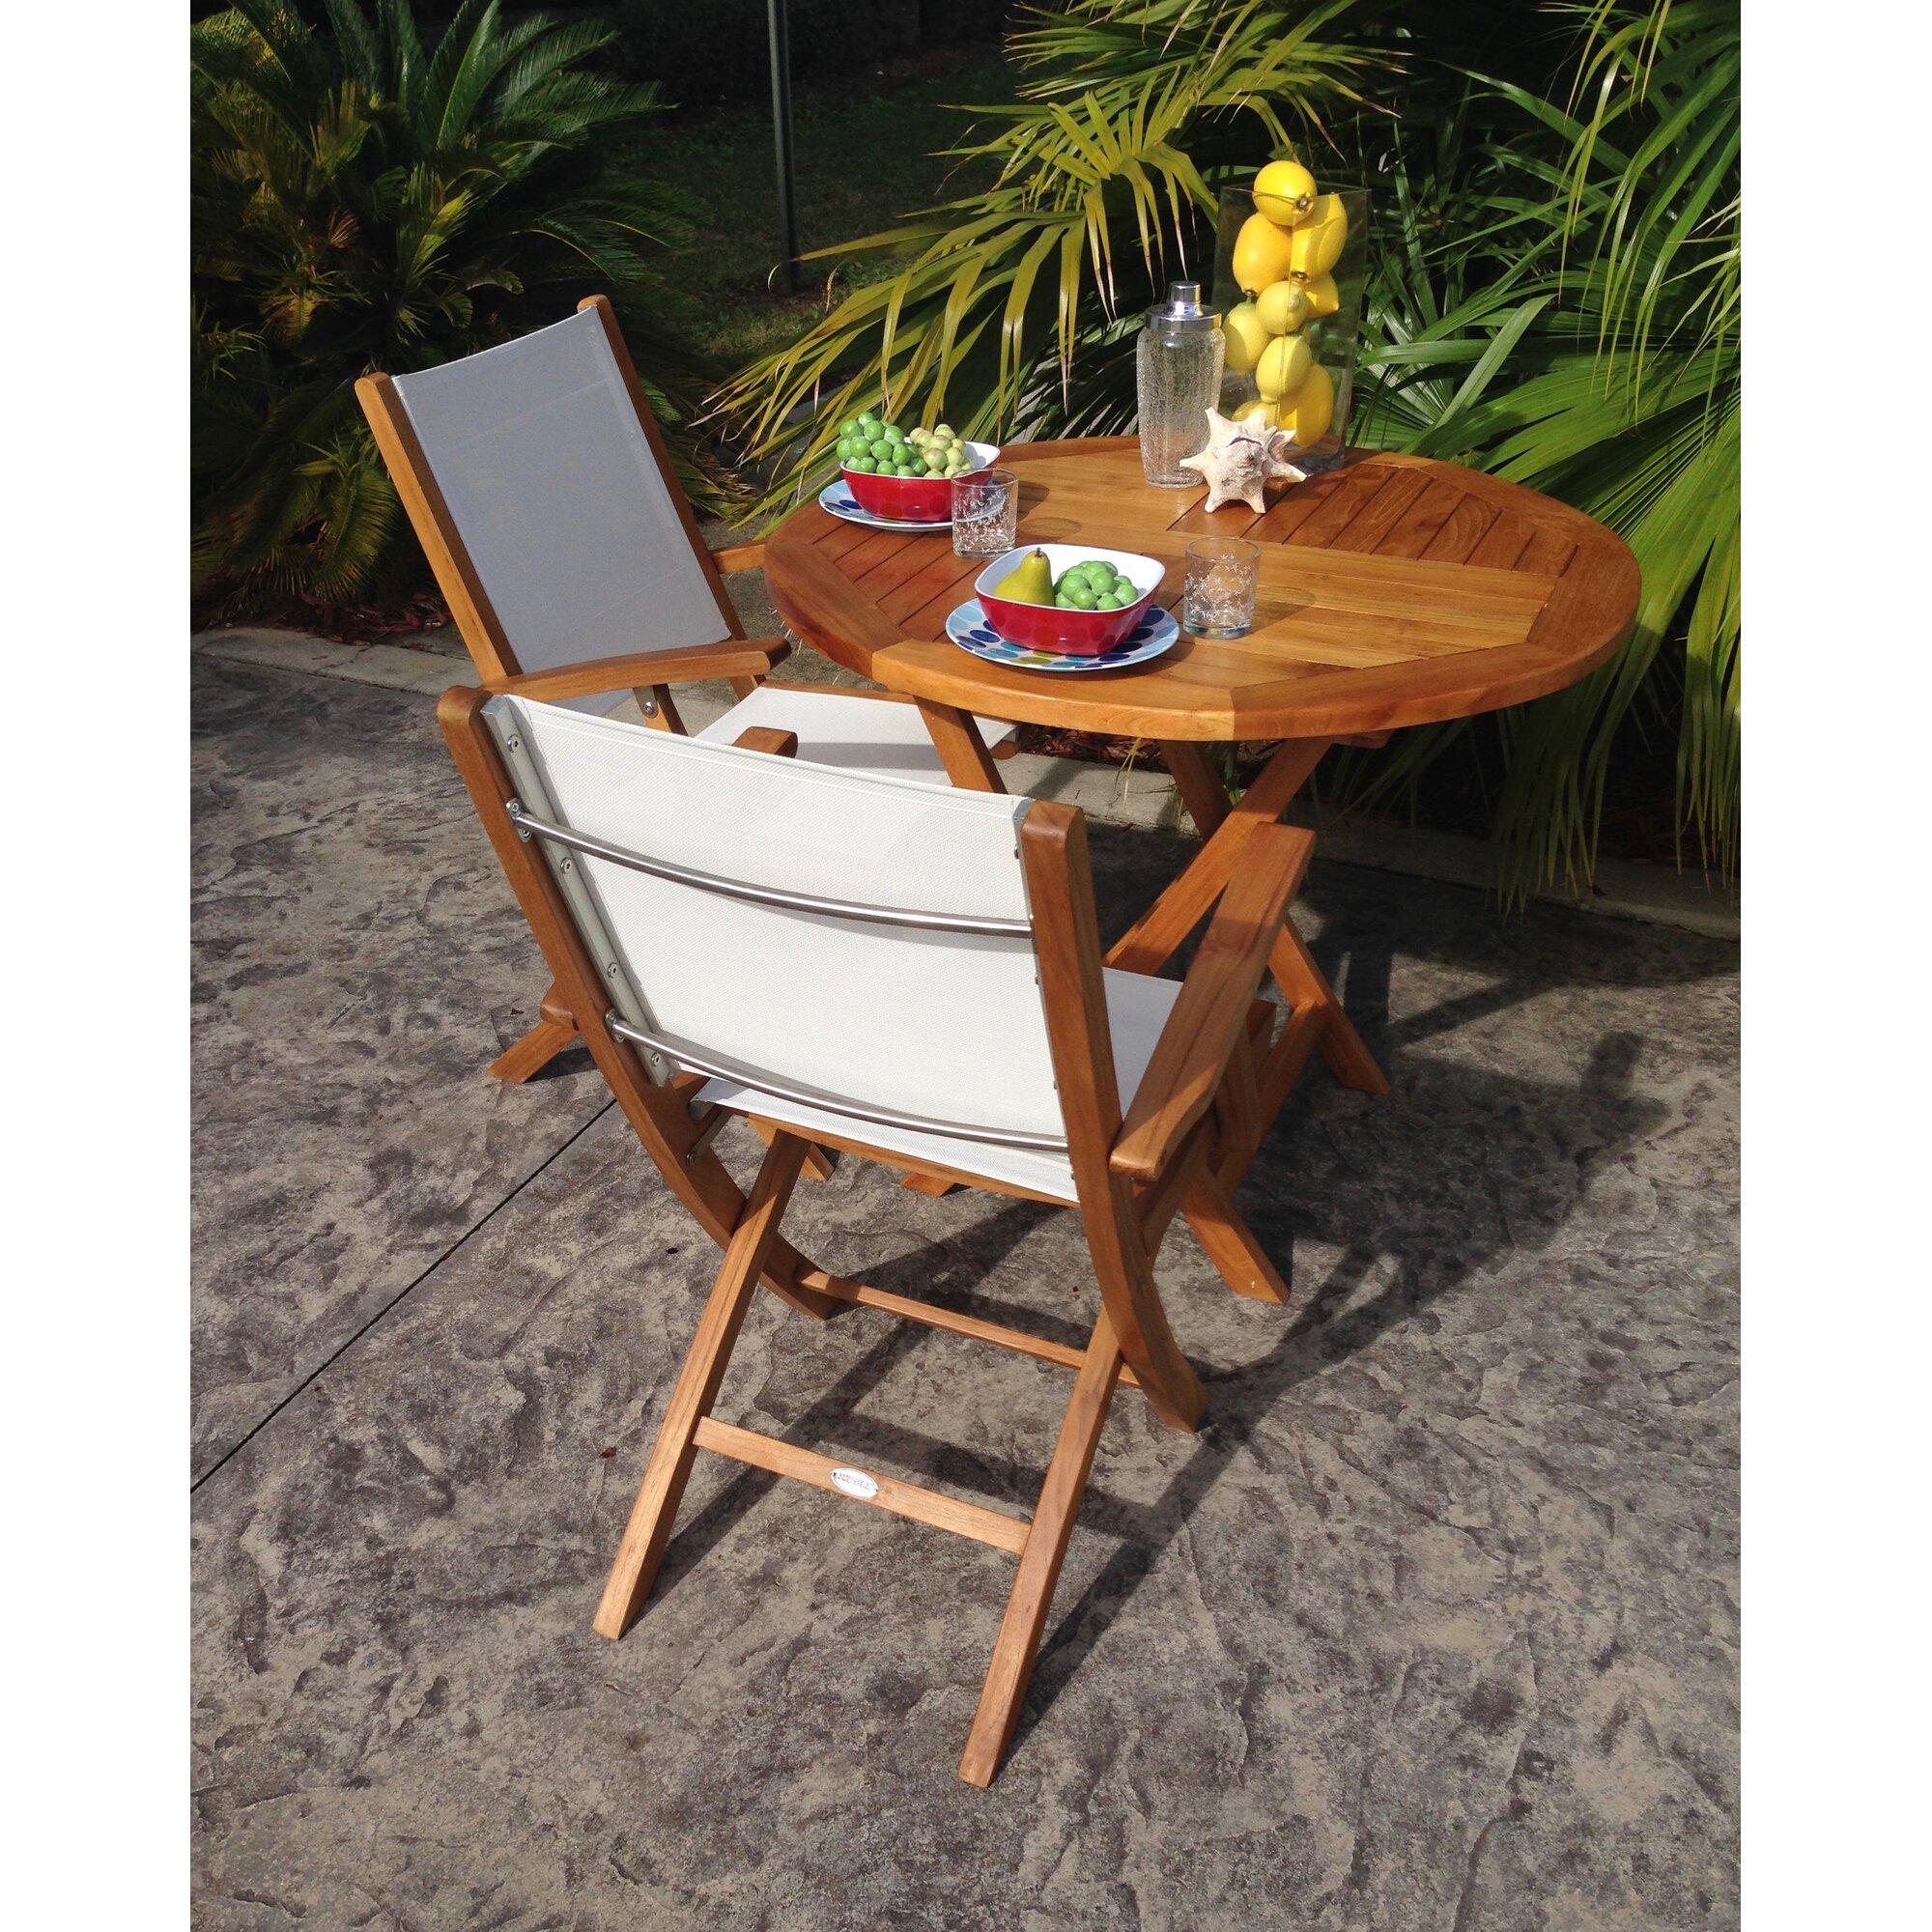 ChicTeak Elzas Teak Folding Dining Table & Reviews | Wayfair